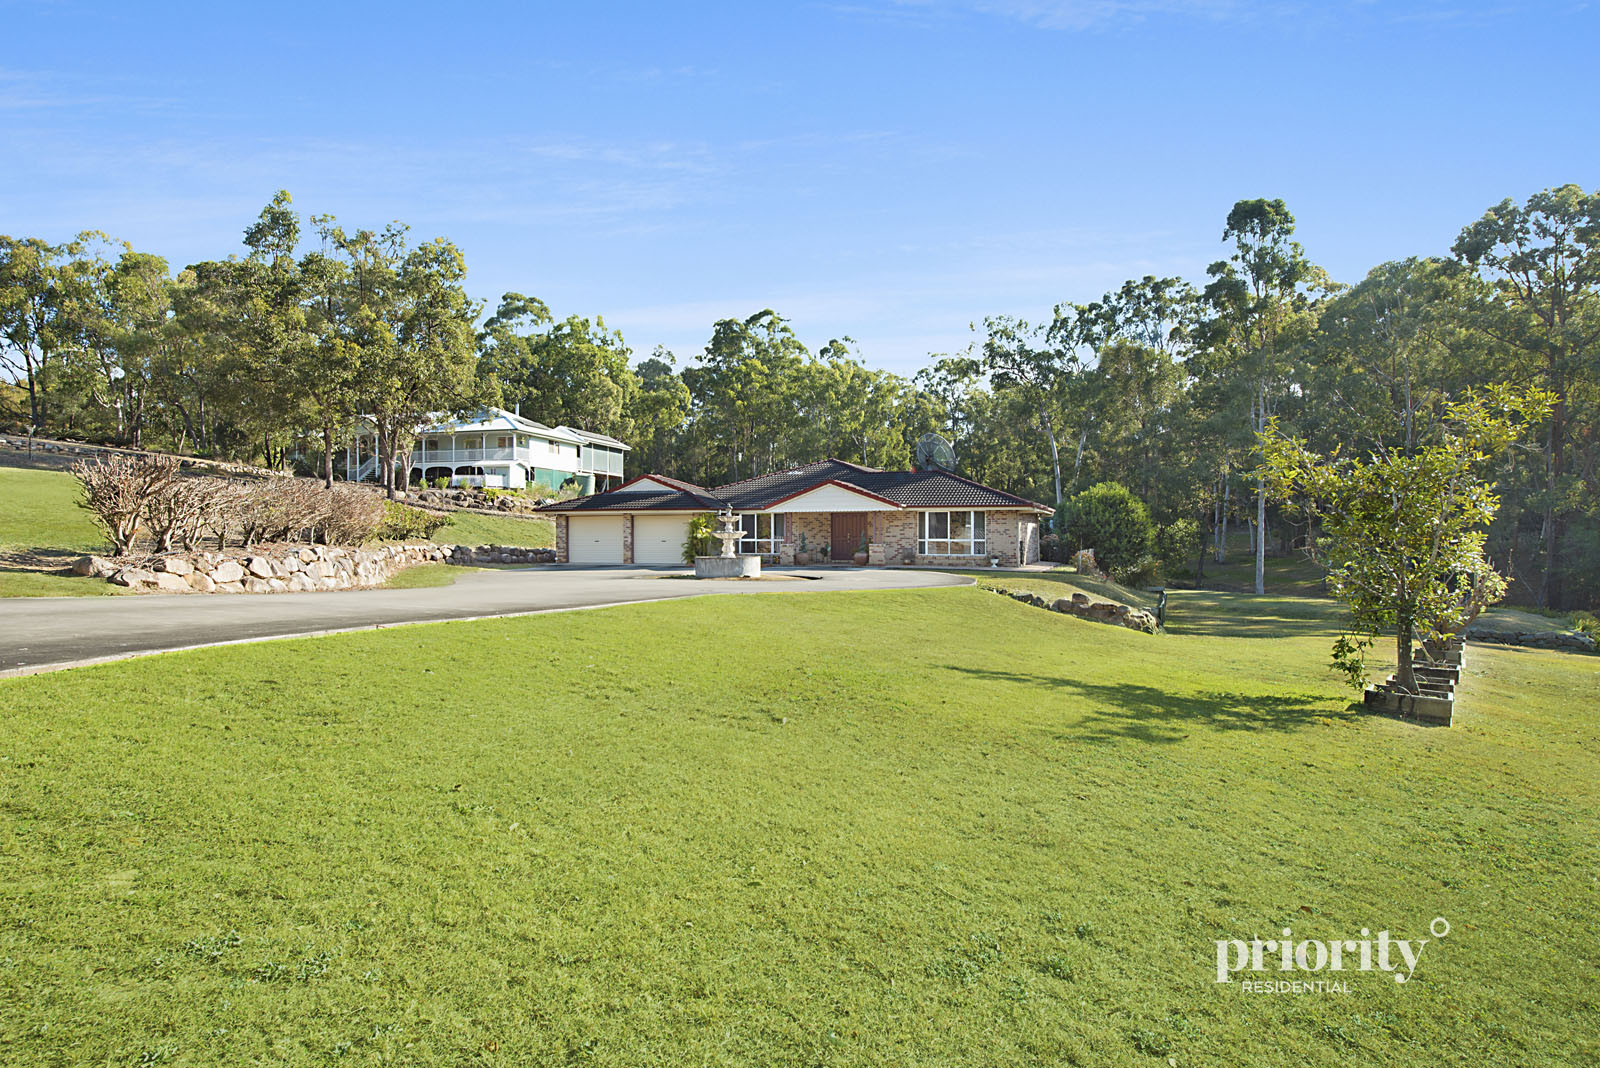 Spacious home on usable acreage